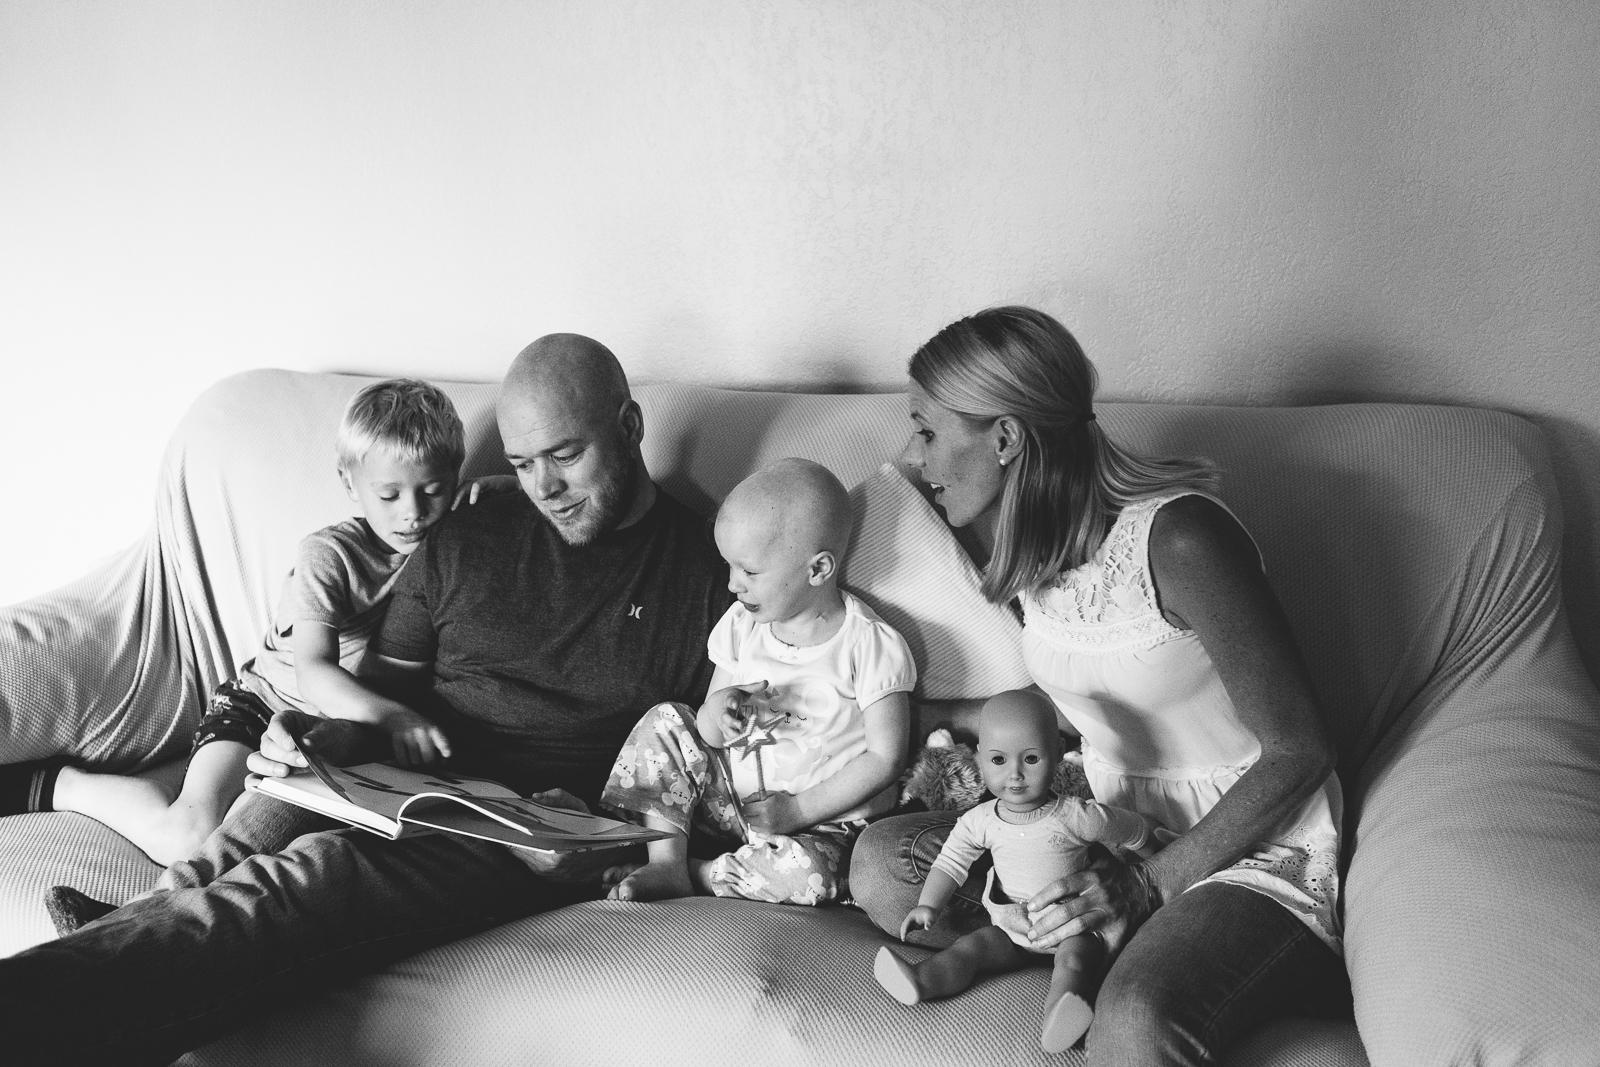 gaumnitzfamilyblogpost-58.jpg